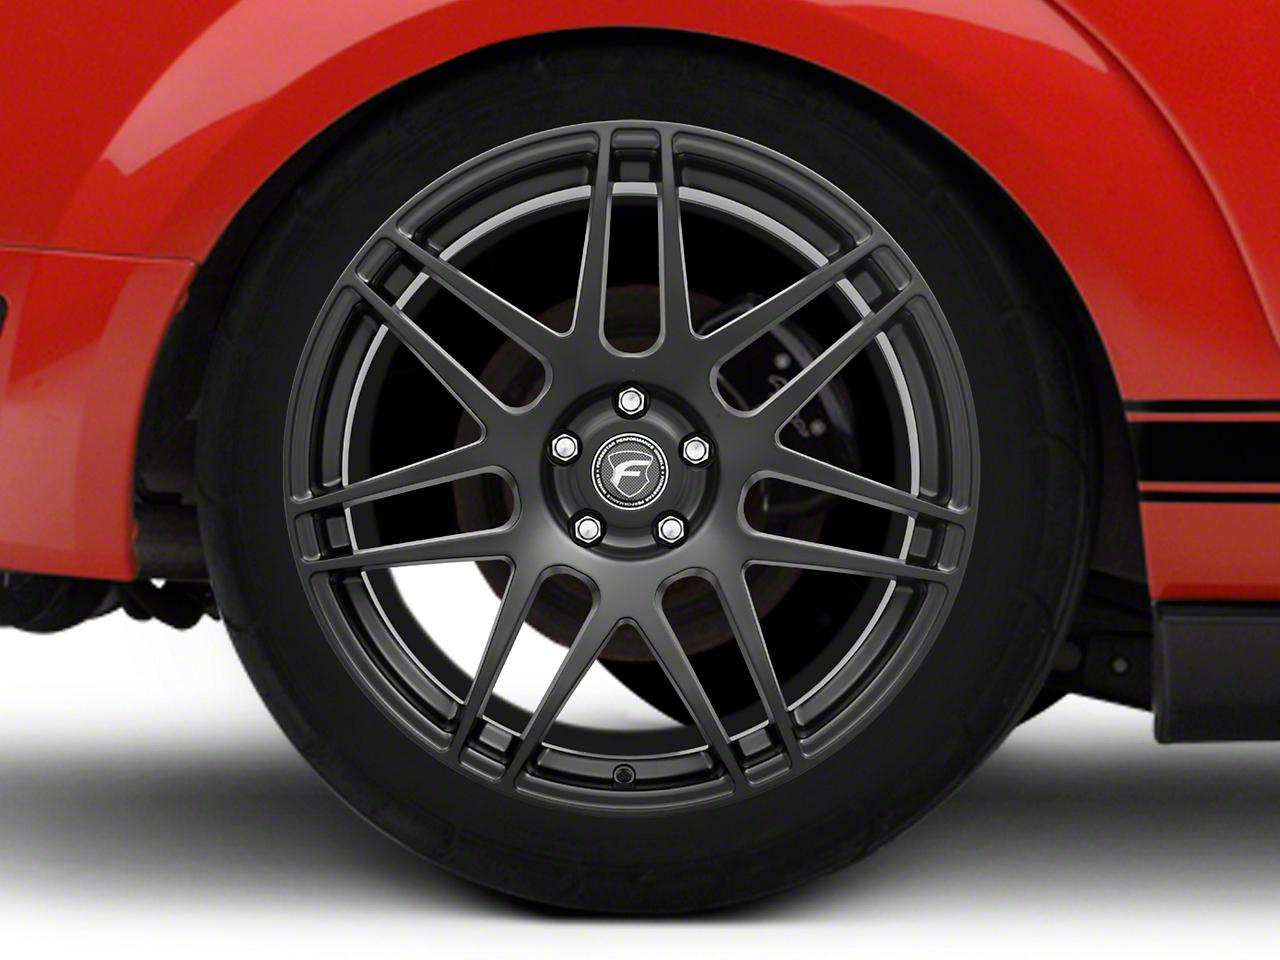 Forgestar F14 Deep Concave Monoblock Matte Black Wheel - 20x11 (05-14 All)